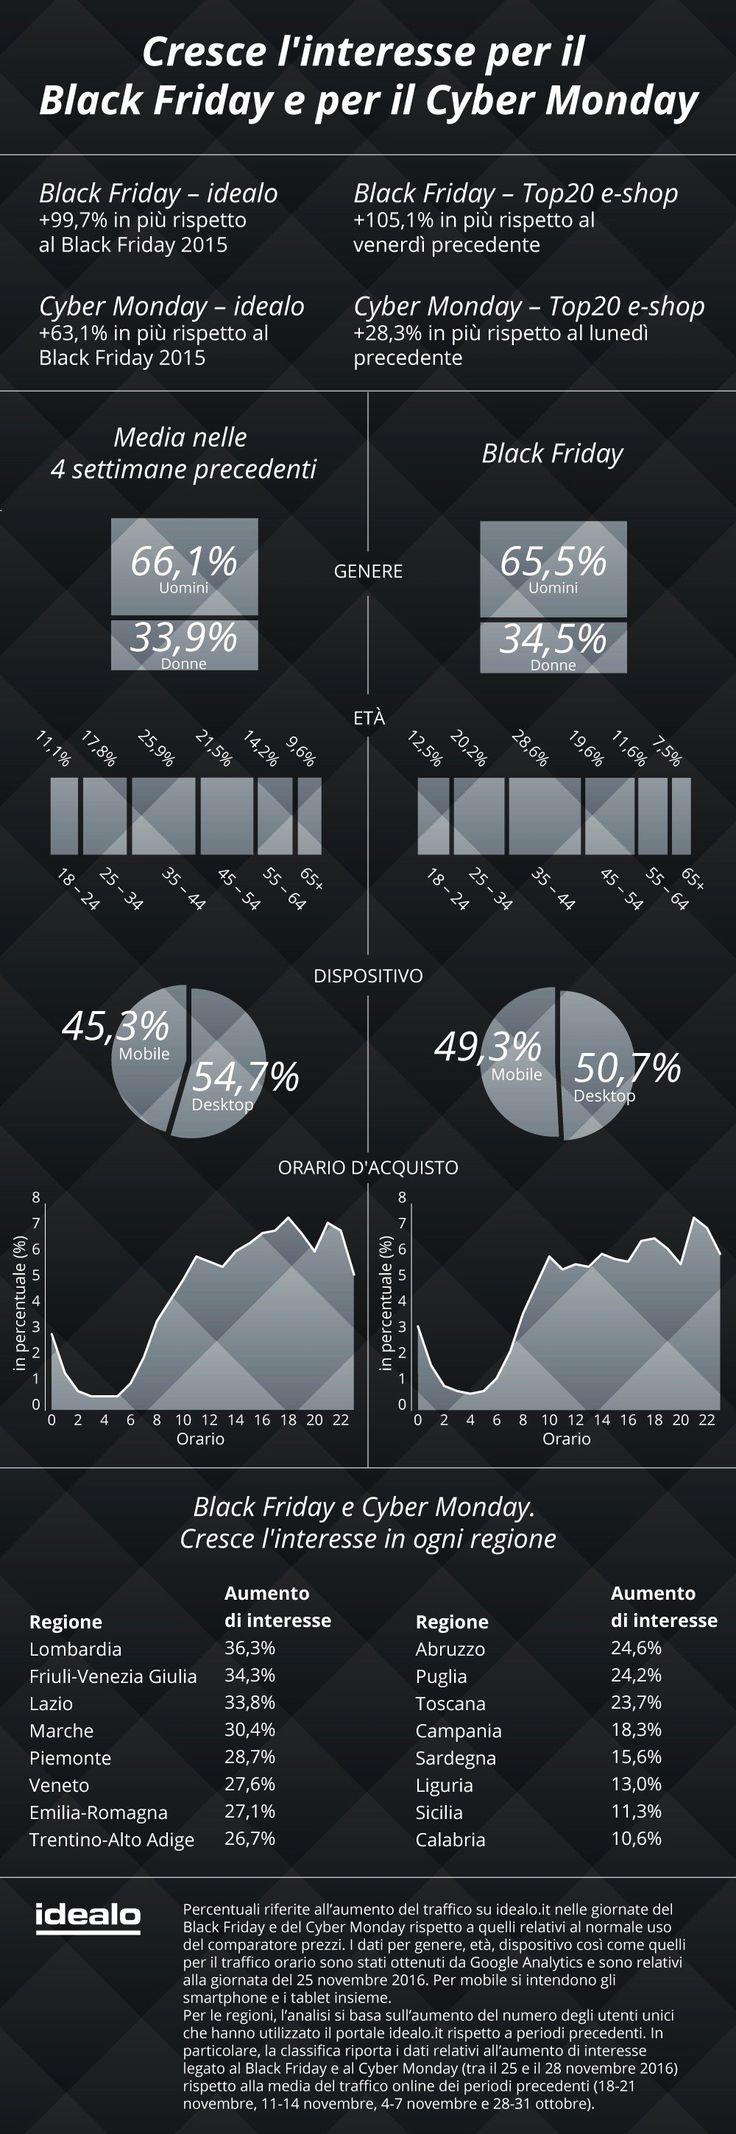 Infografica idealo Black Friday Cyber Monday in Italia